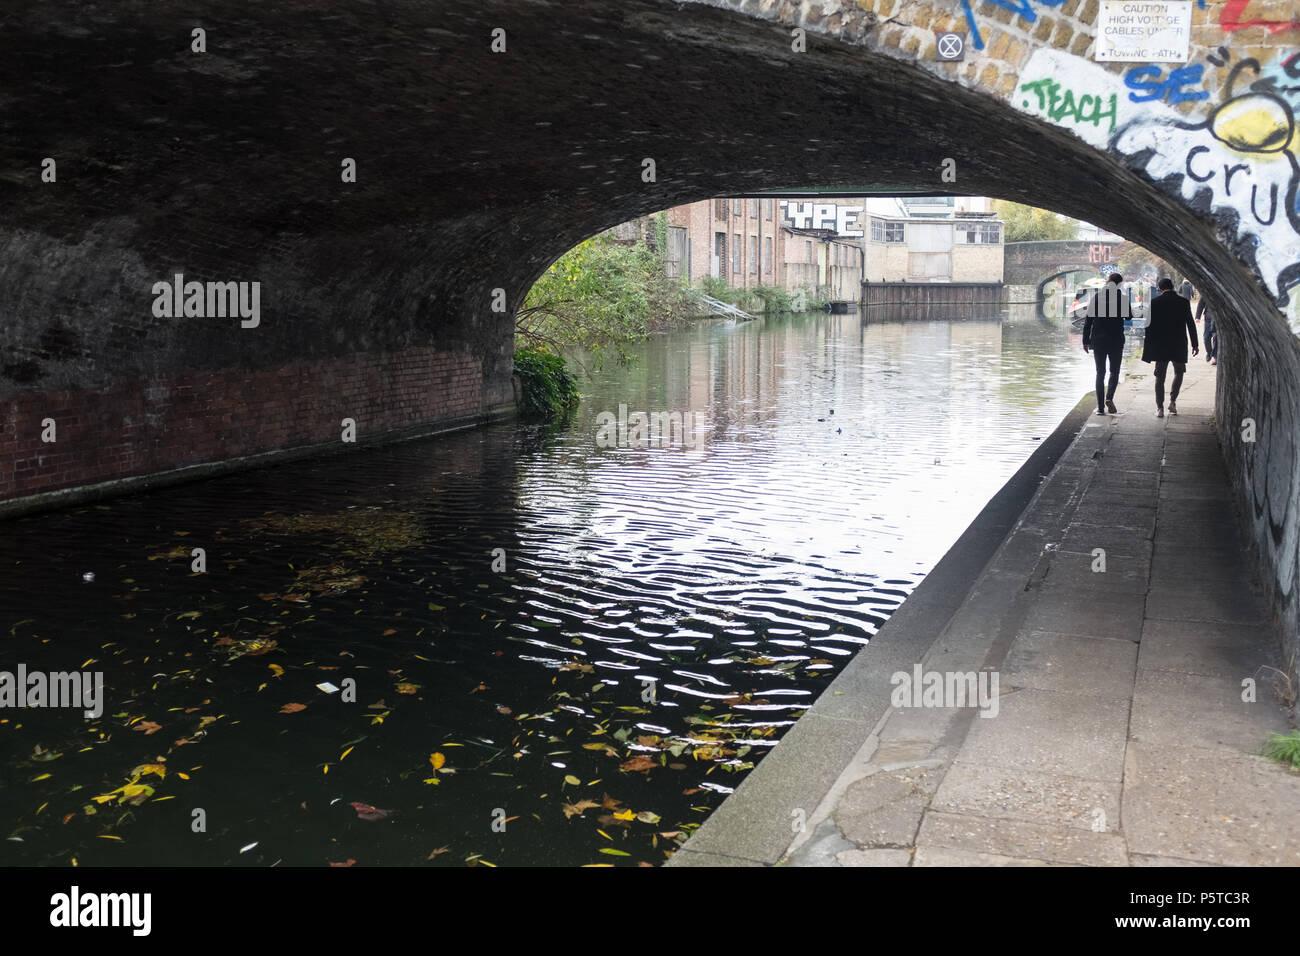 People Walking Under Tunnel Alongside Canal, Hackney, London, England, UK. Stock Photo